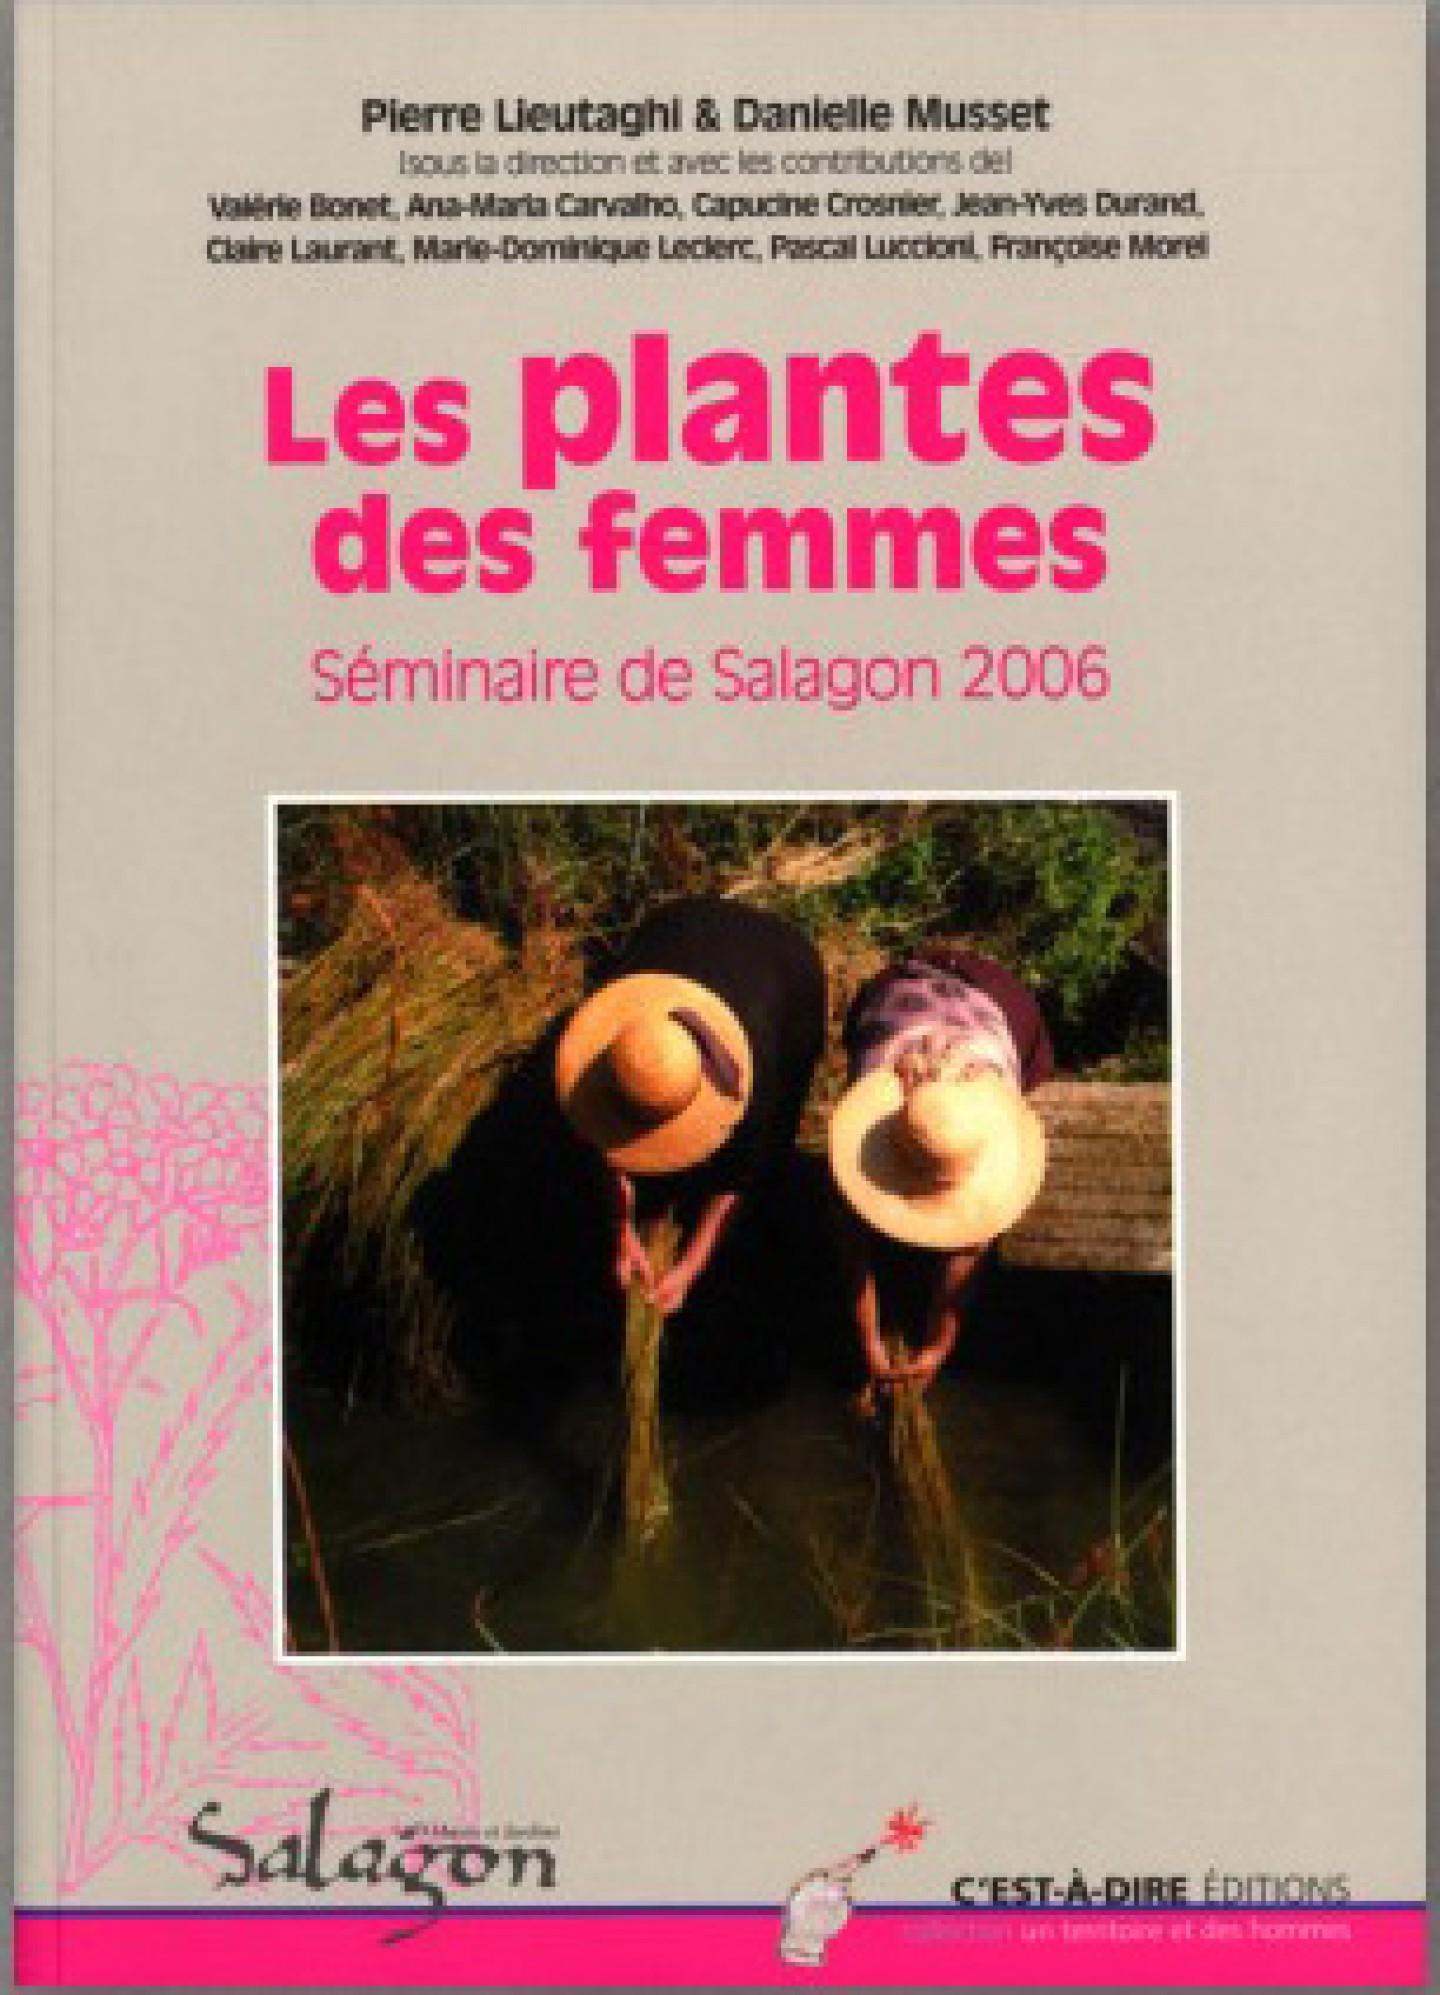 Les Plantes des femmes. Actes du colloque 2006 de Salagon